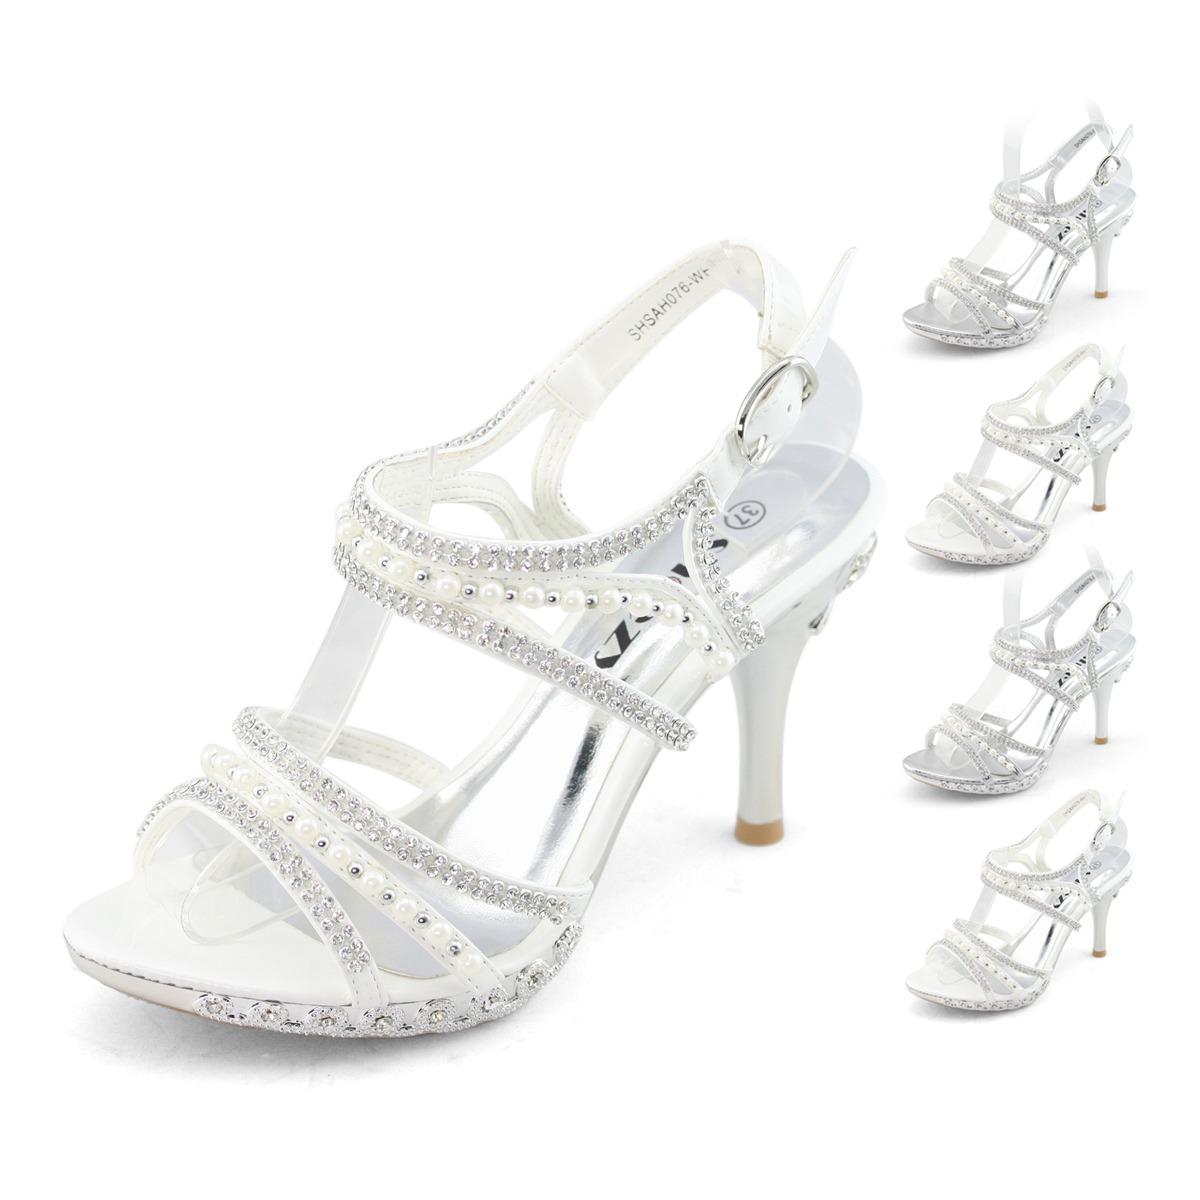 SHOEZY-Gorgeous-womens-pearl-crystals-bridal-dress-comfort-heels-platform-shoes